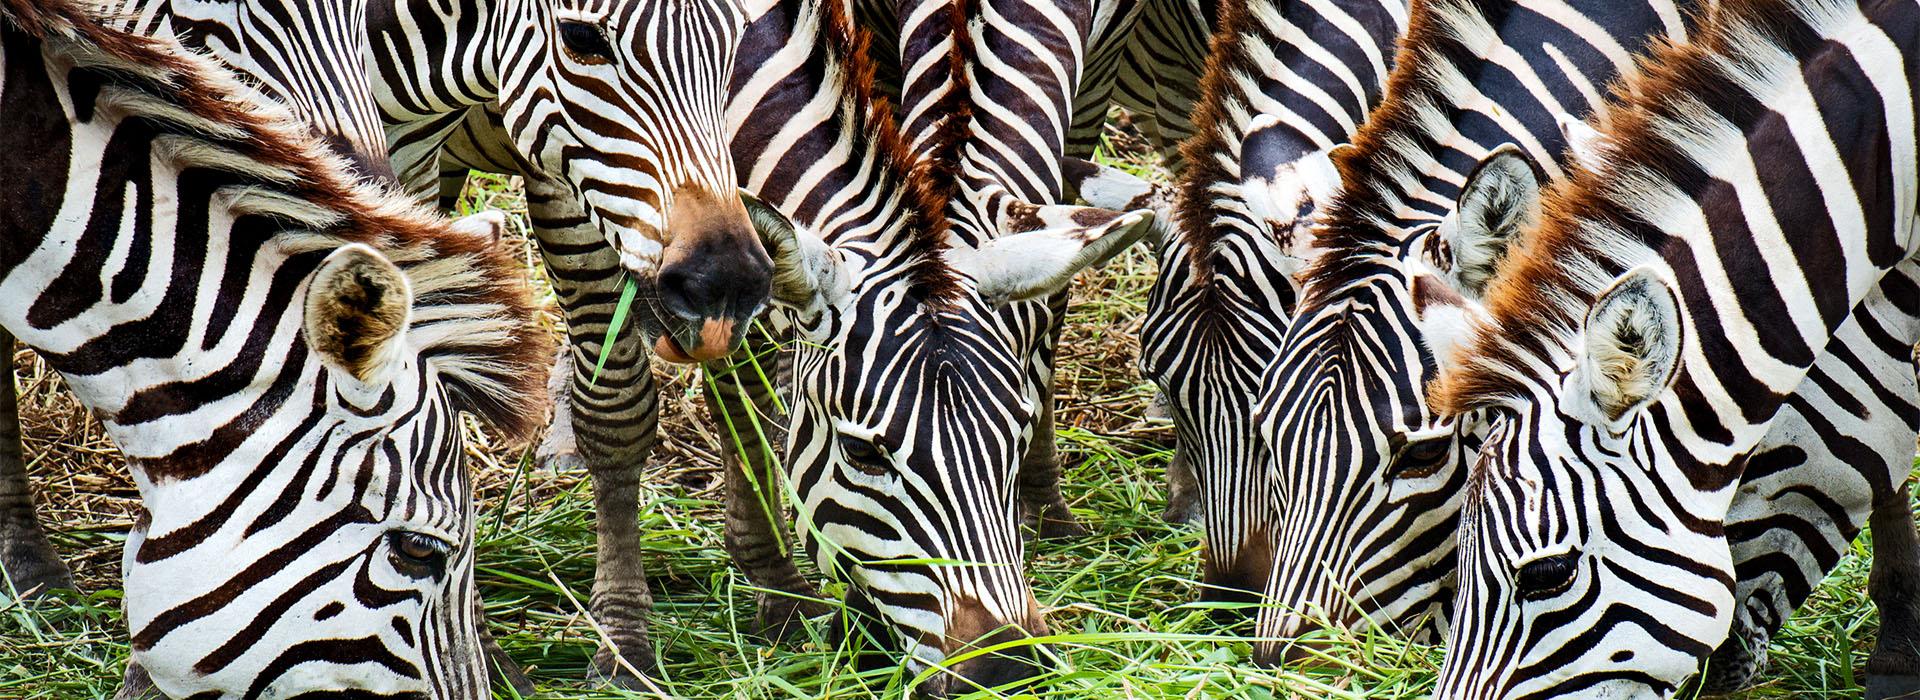 Zebras at Meru National Park Top Destinations in Kenya - African Adventure Specialists